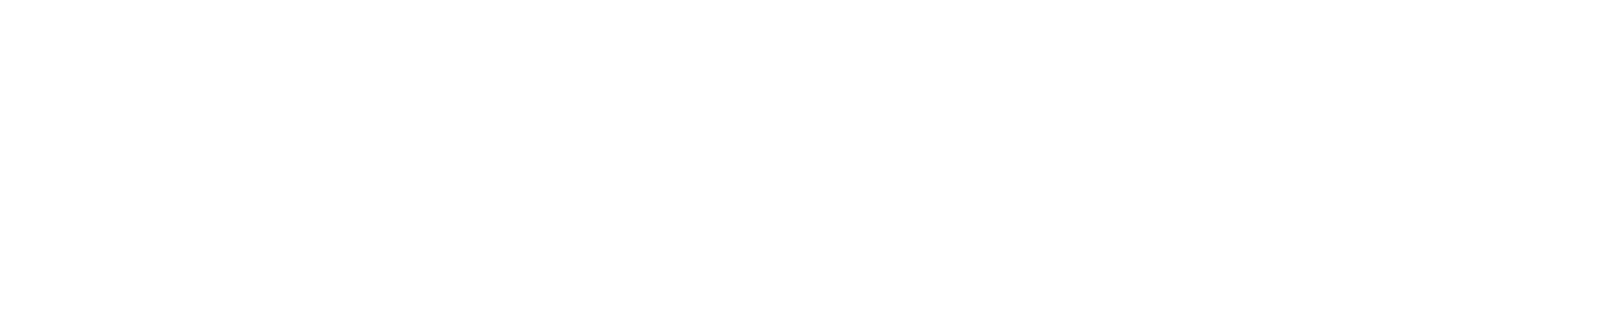 Ecomfy Lead